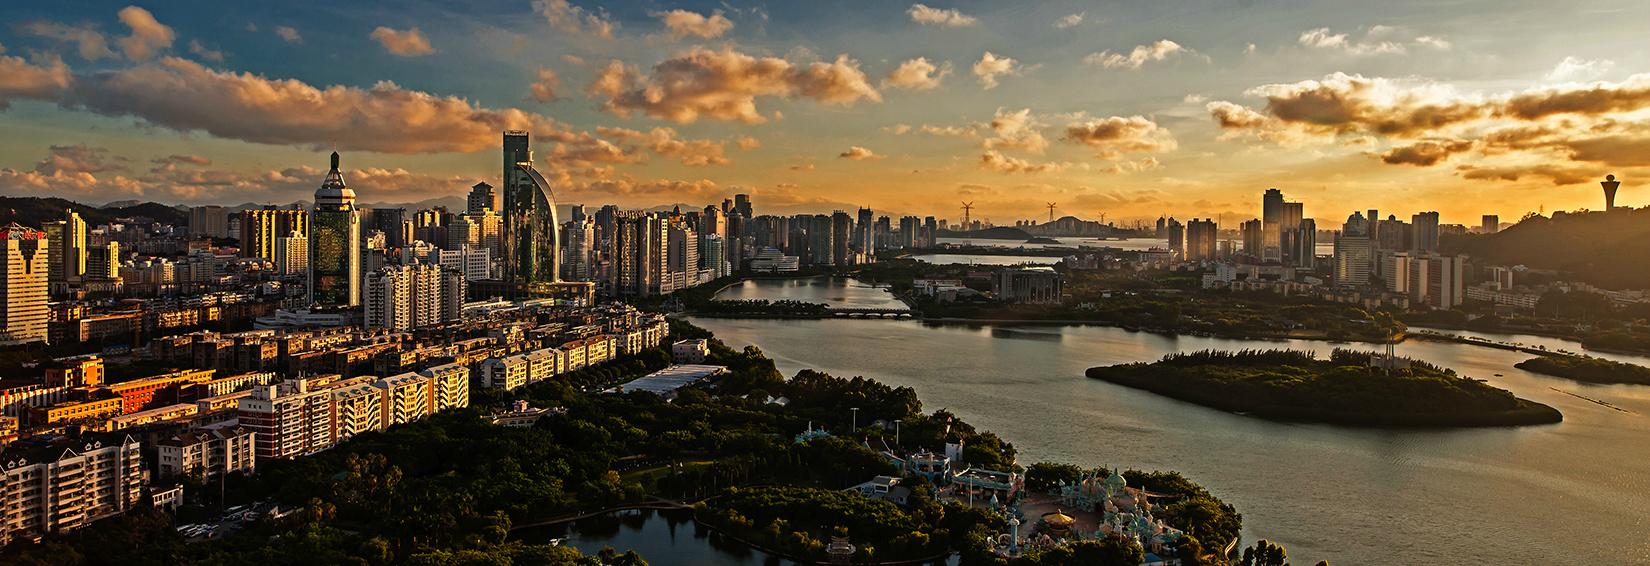 xiamen cityscape skyline